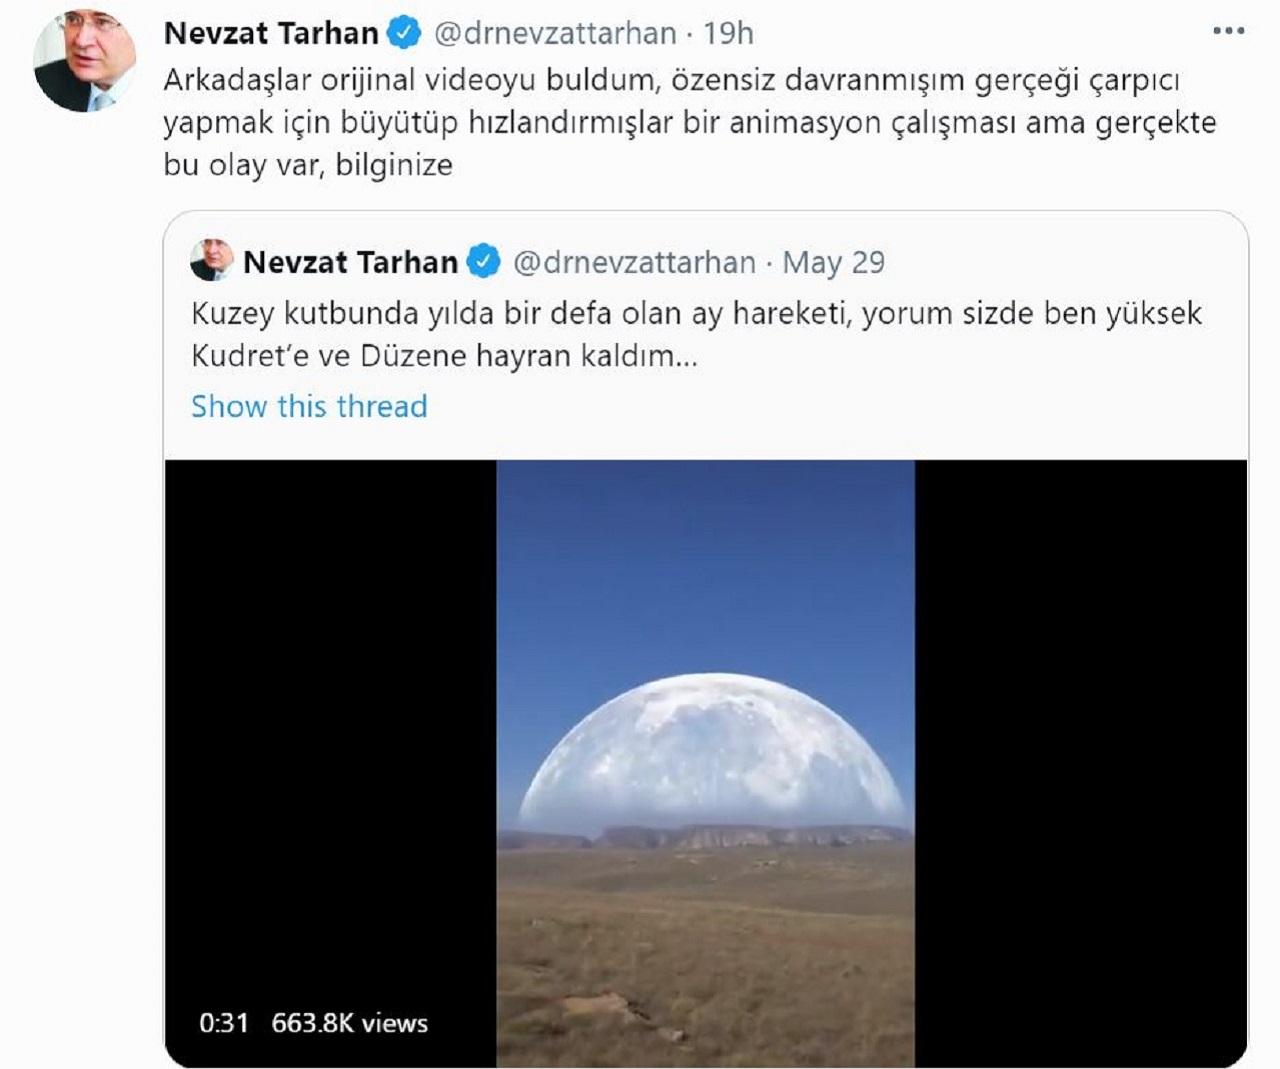 Nevzat Tarhan tweet